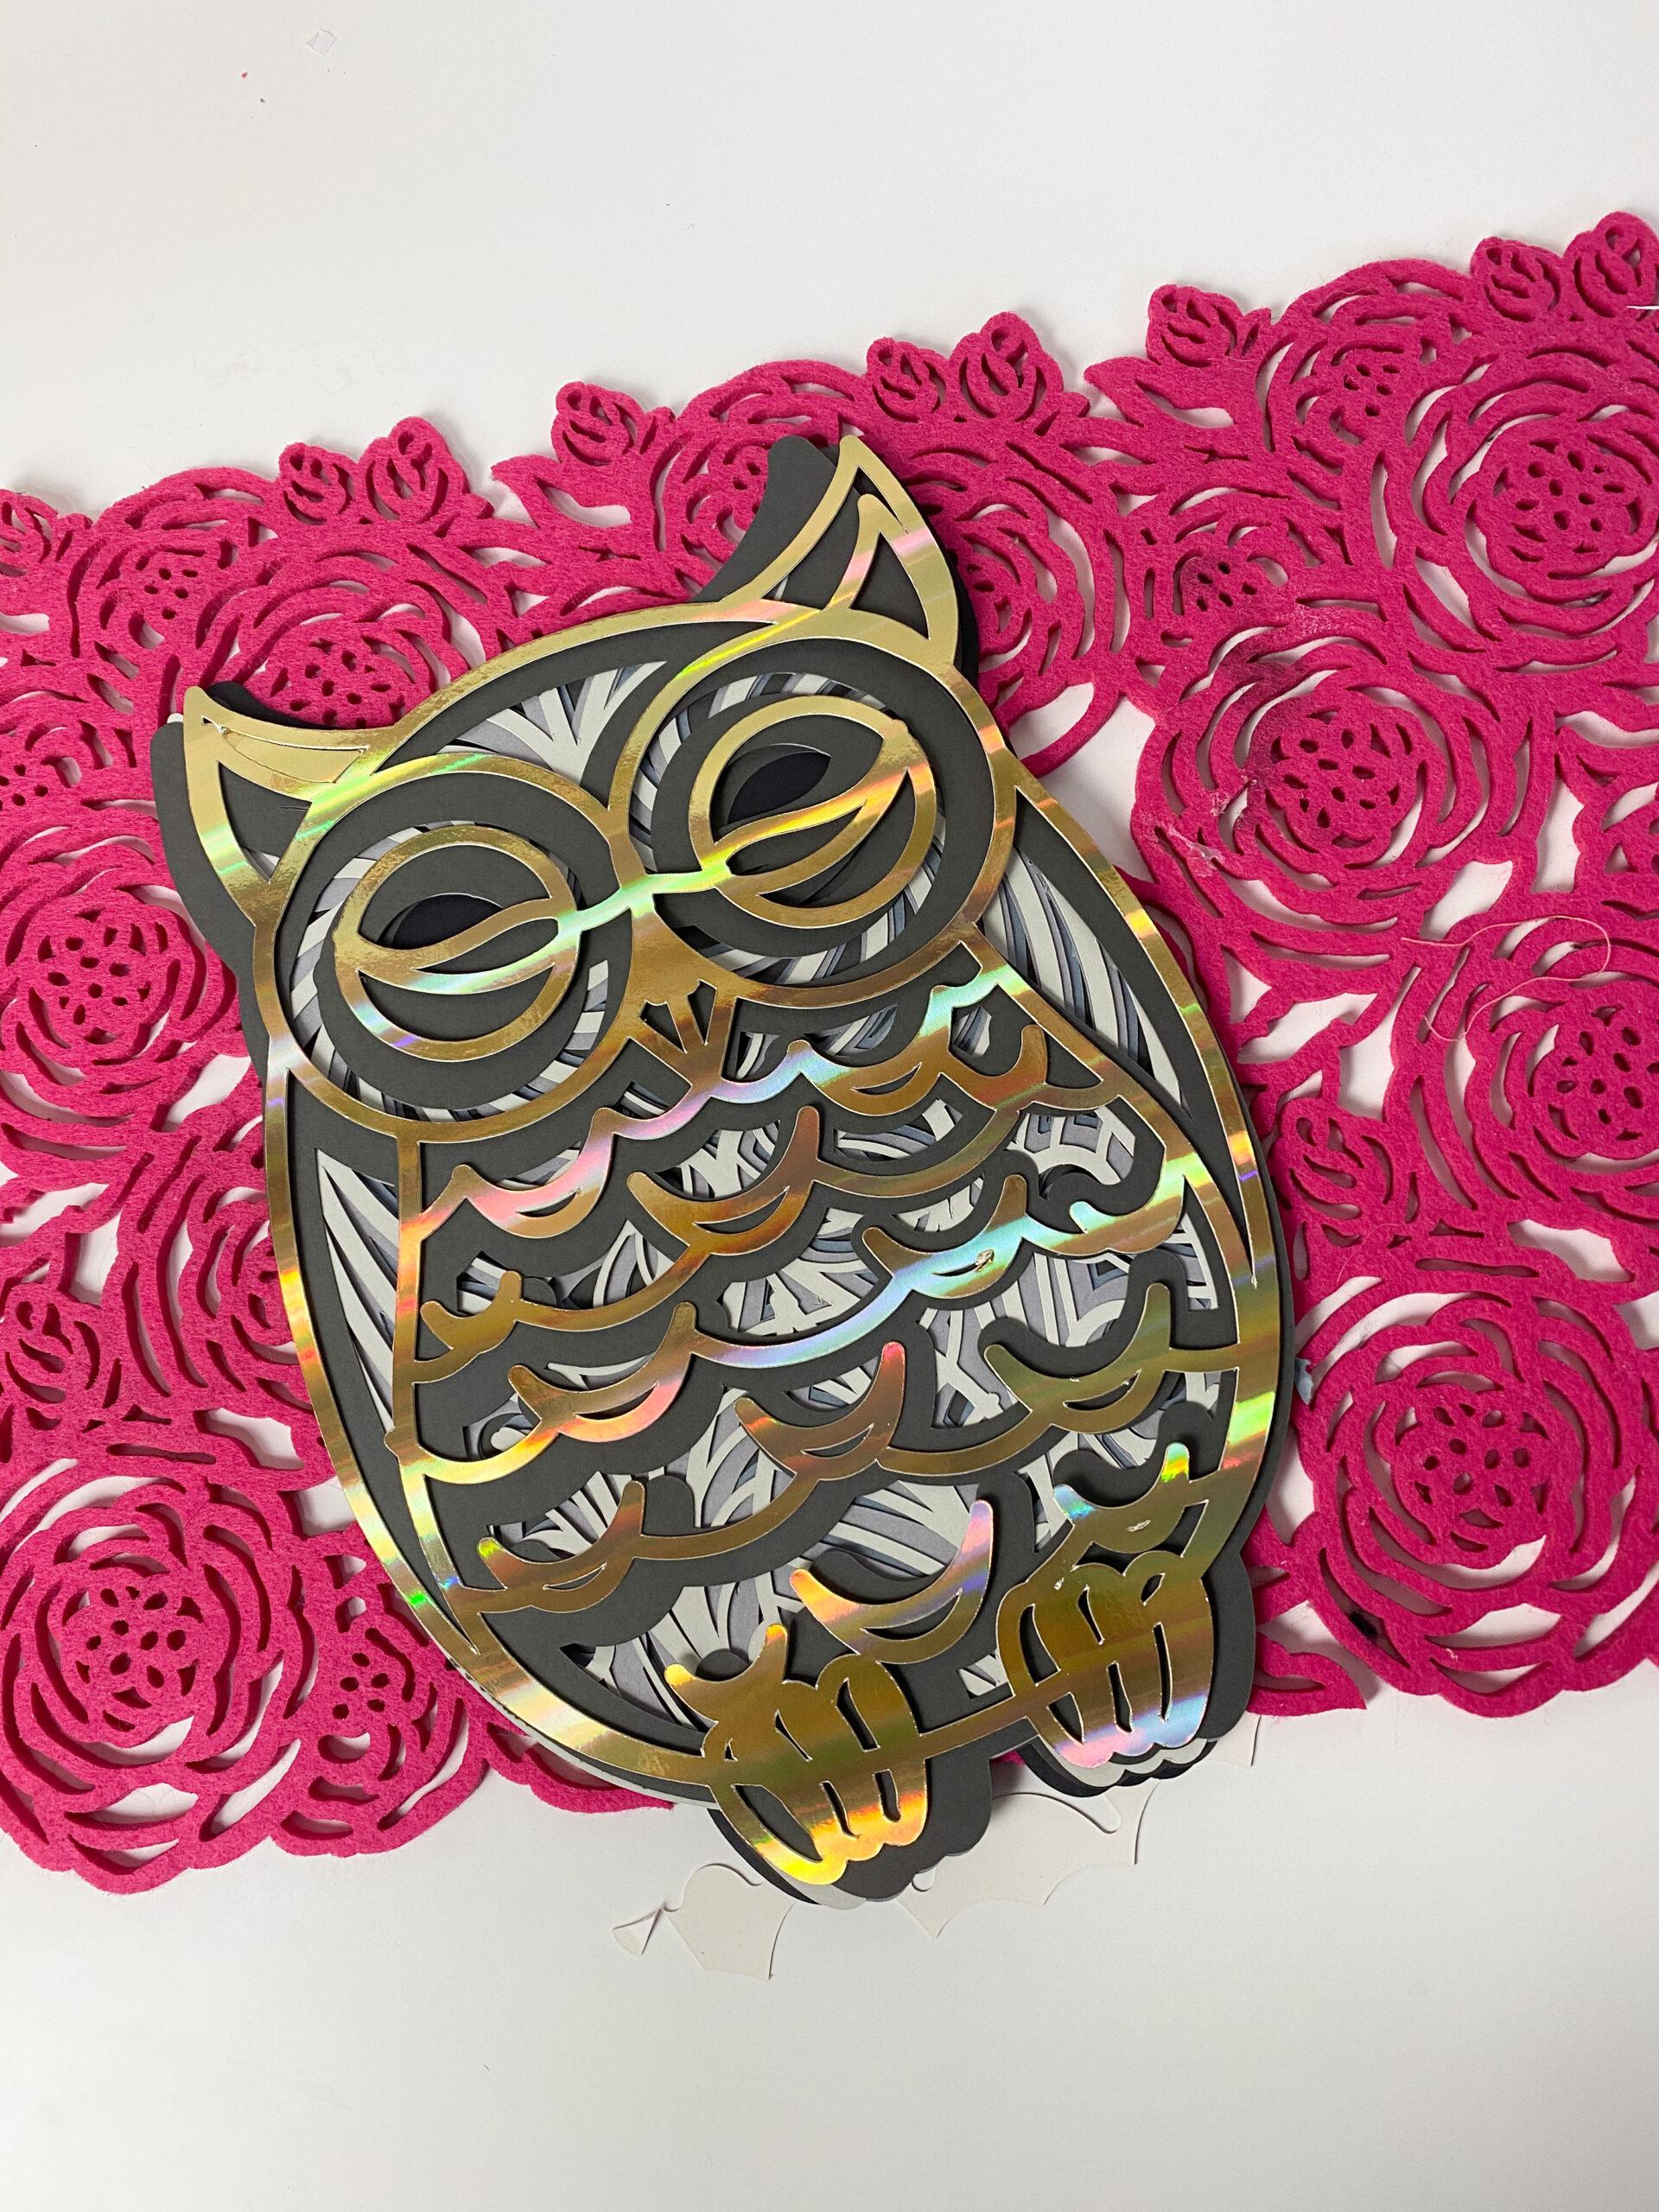 102+ Owl Mandala Svg Free – SVG,PNG,DXF,EPS include